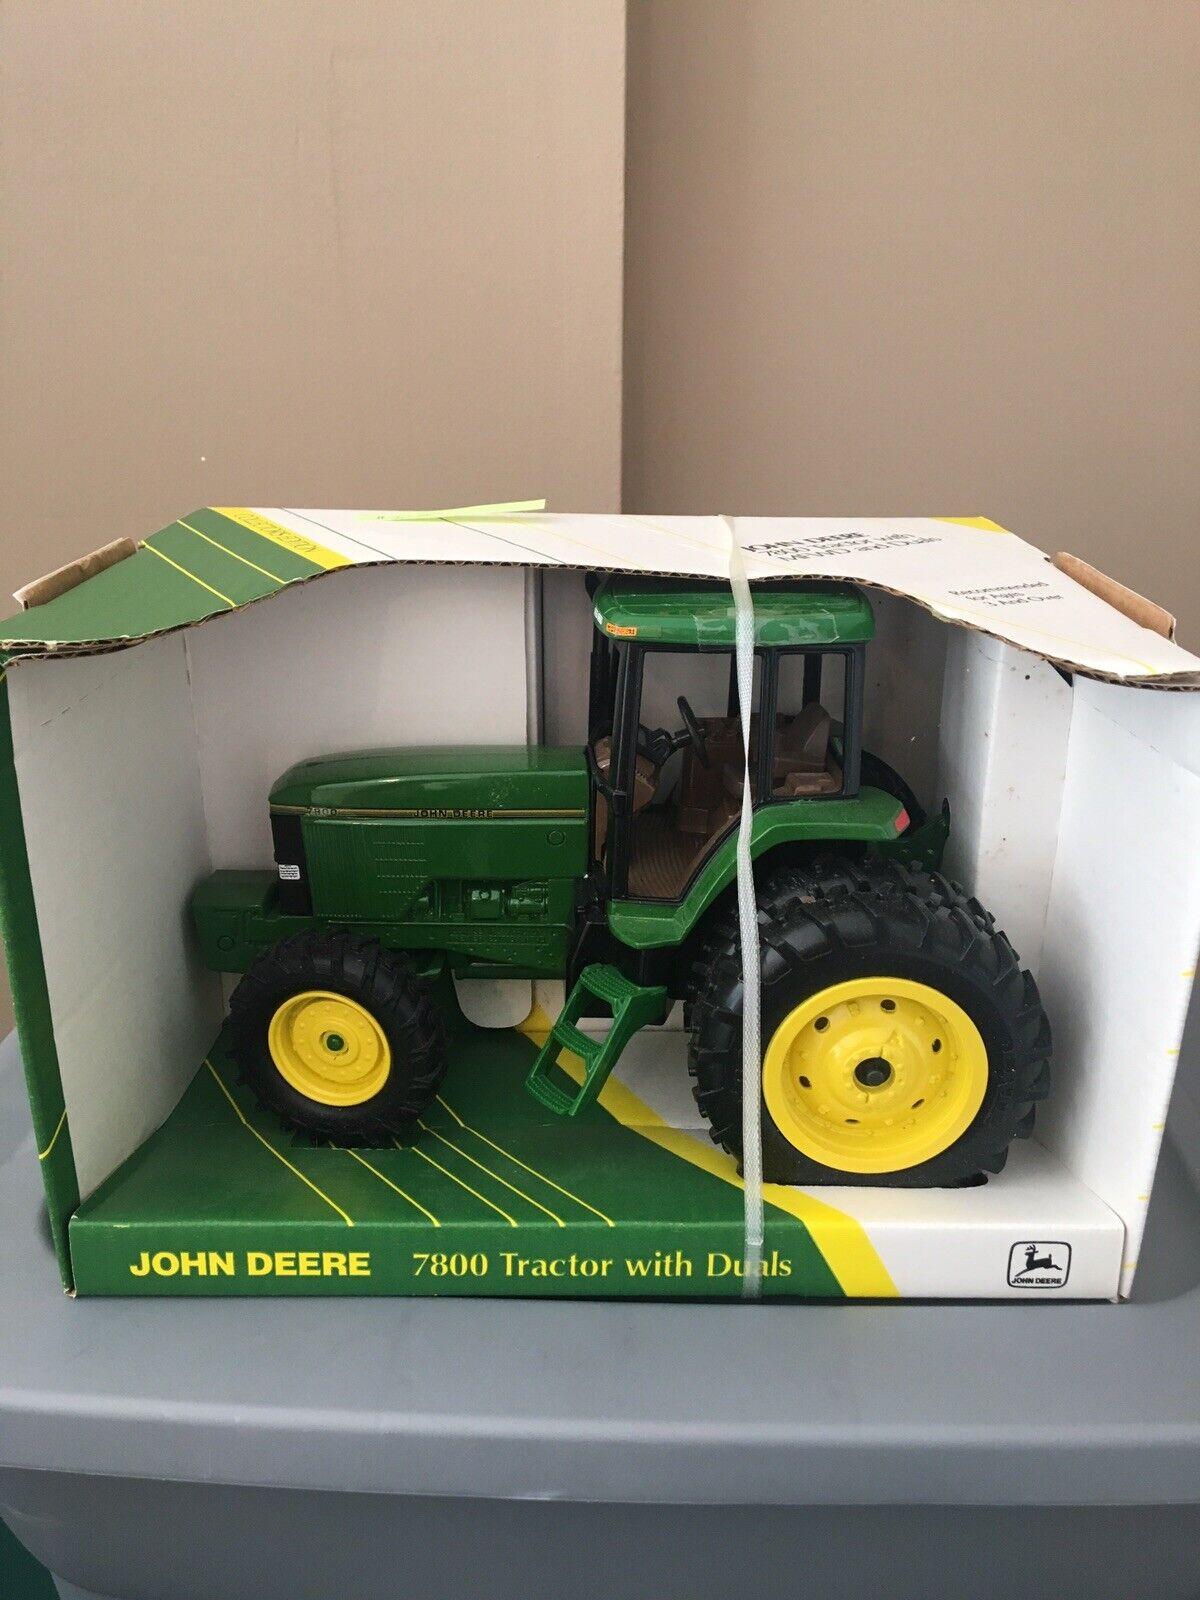 Tractor 7800, con mfwd y Doble embrague, escala 1   16, John Deere - stock